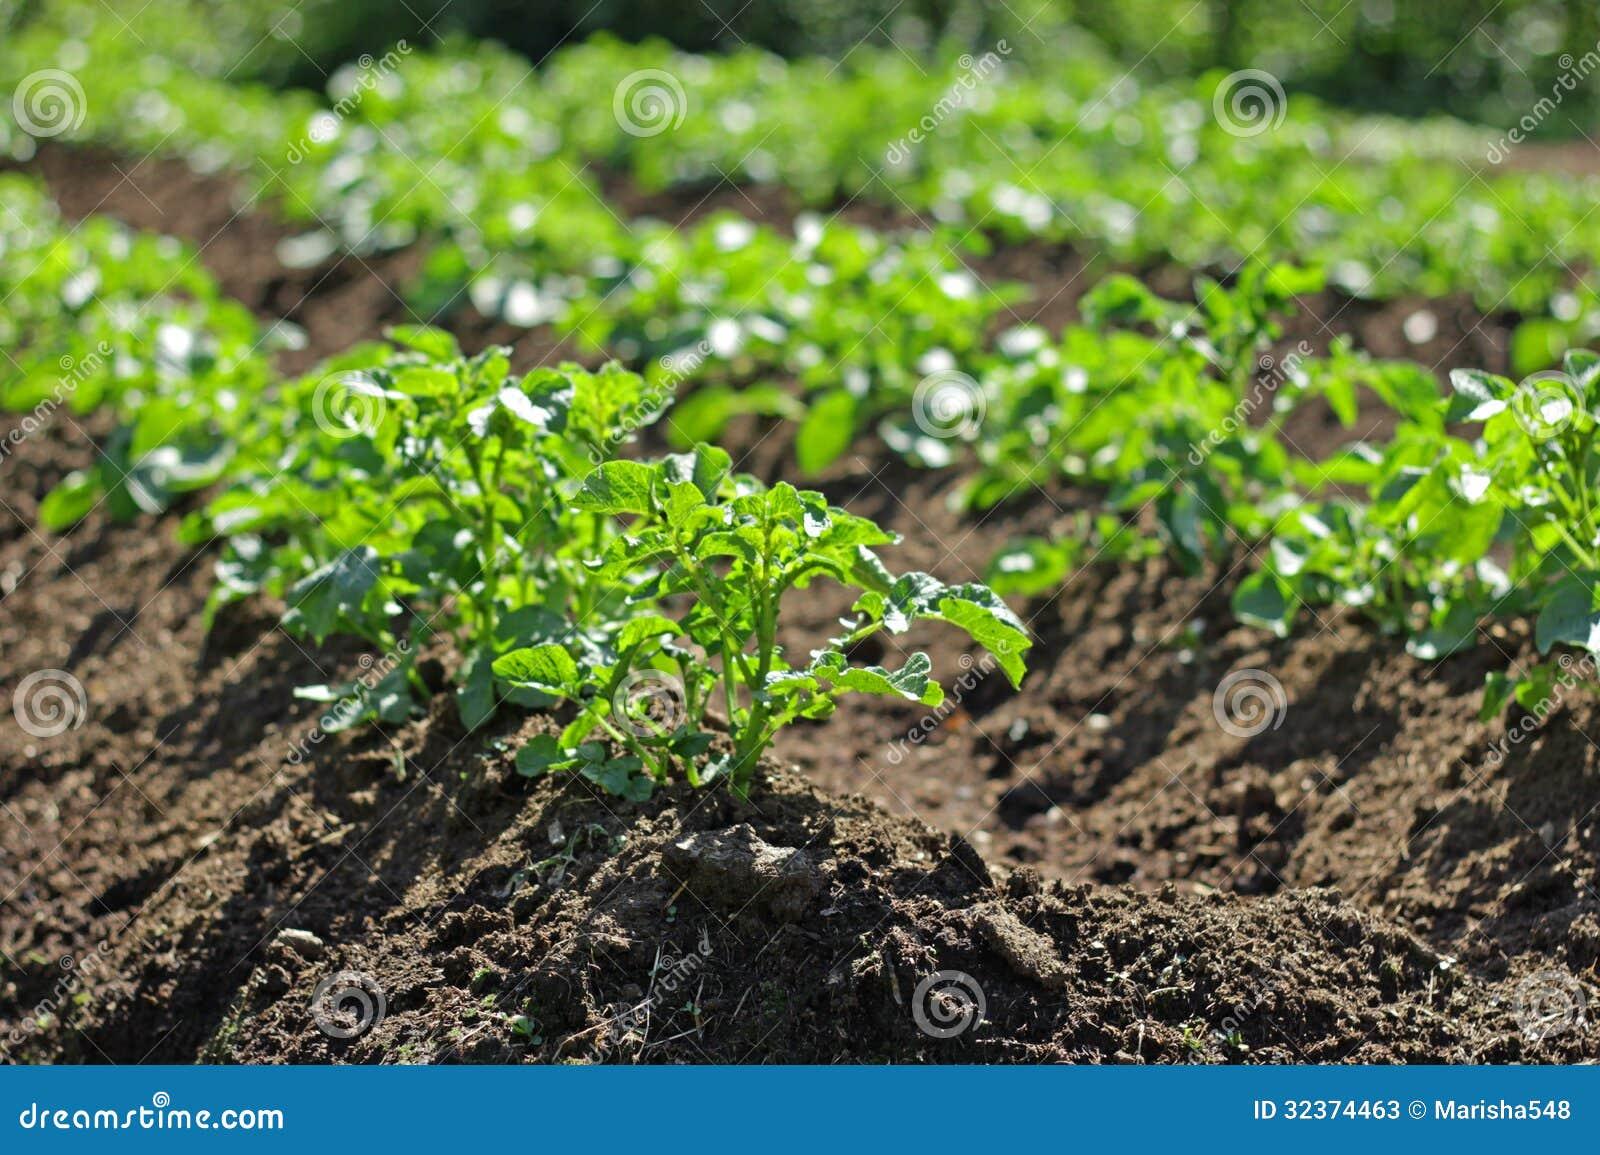 Potatoe plant stock photos image 32374463 for Dream plants for the natural garden